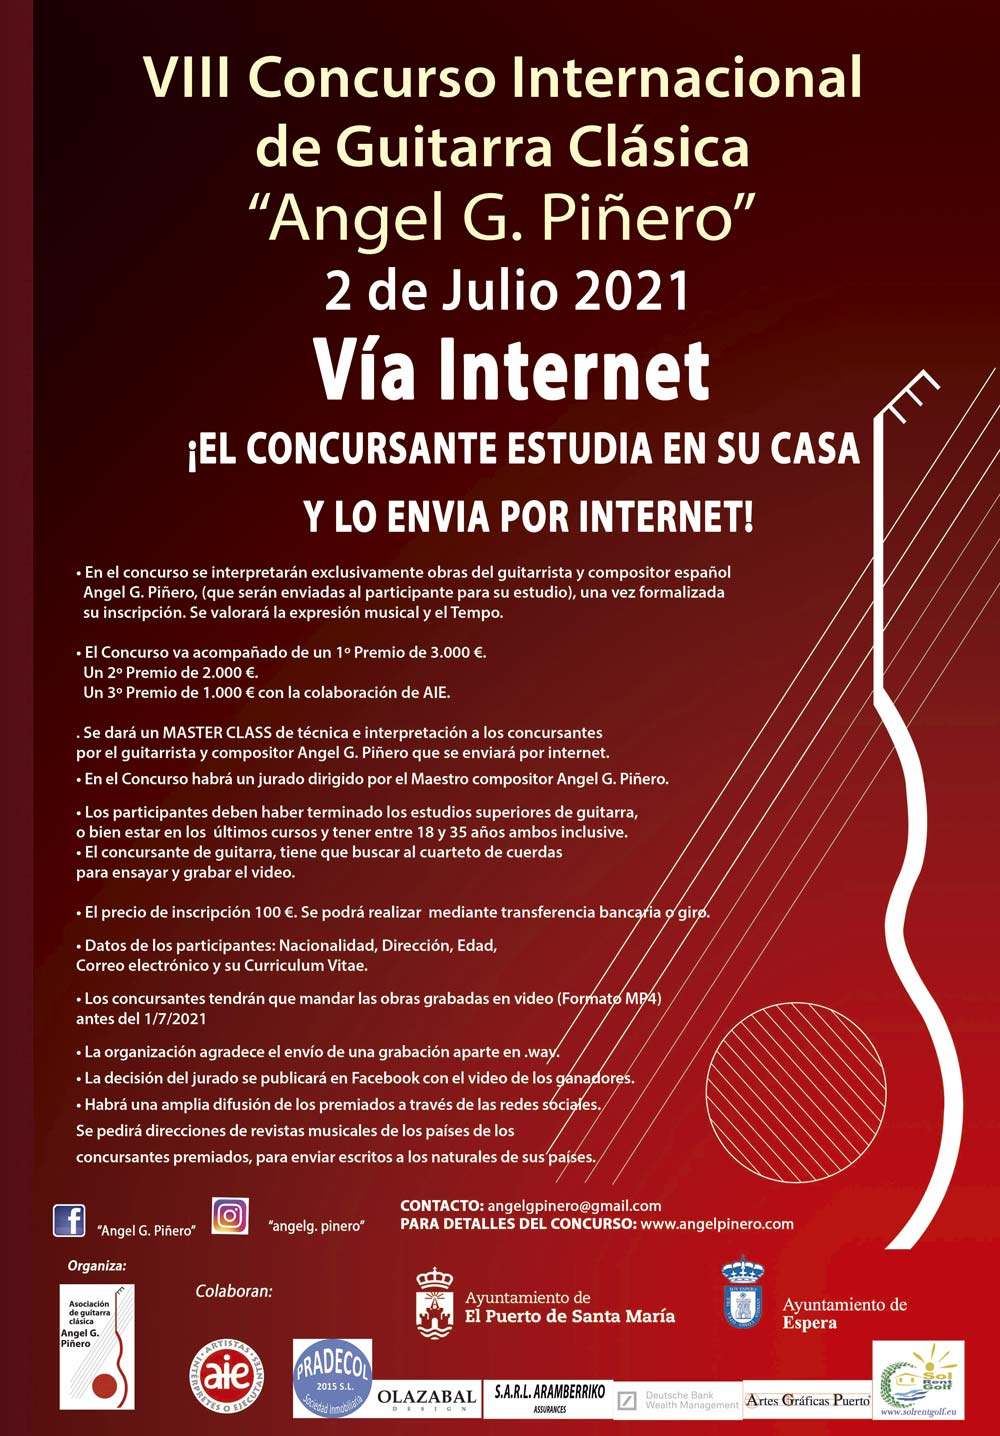 Cartel Concurso Internacional de Guitarra Clásica Angel G. Piñero 2021